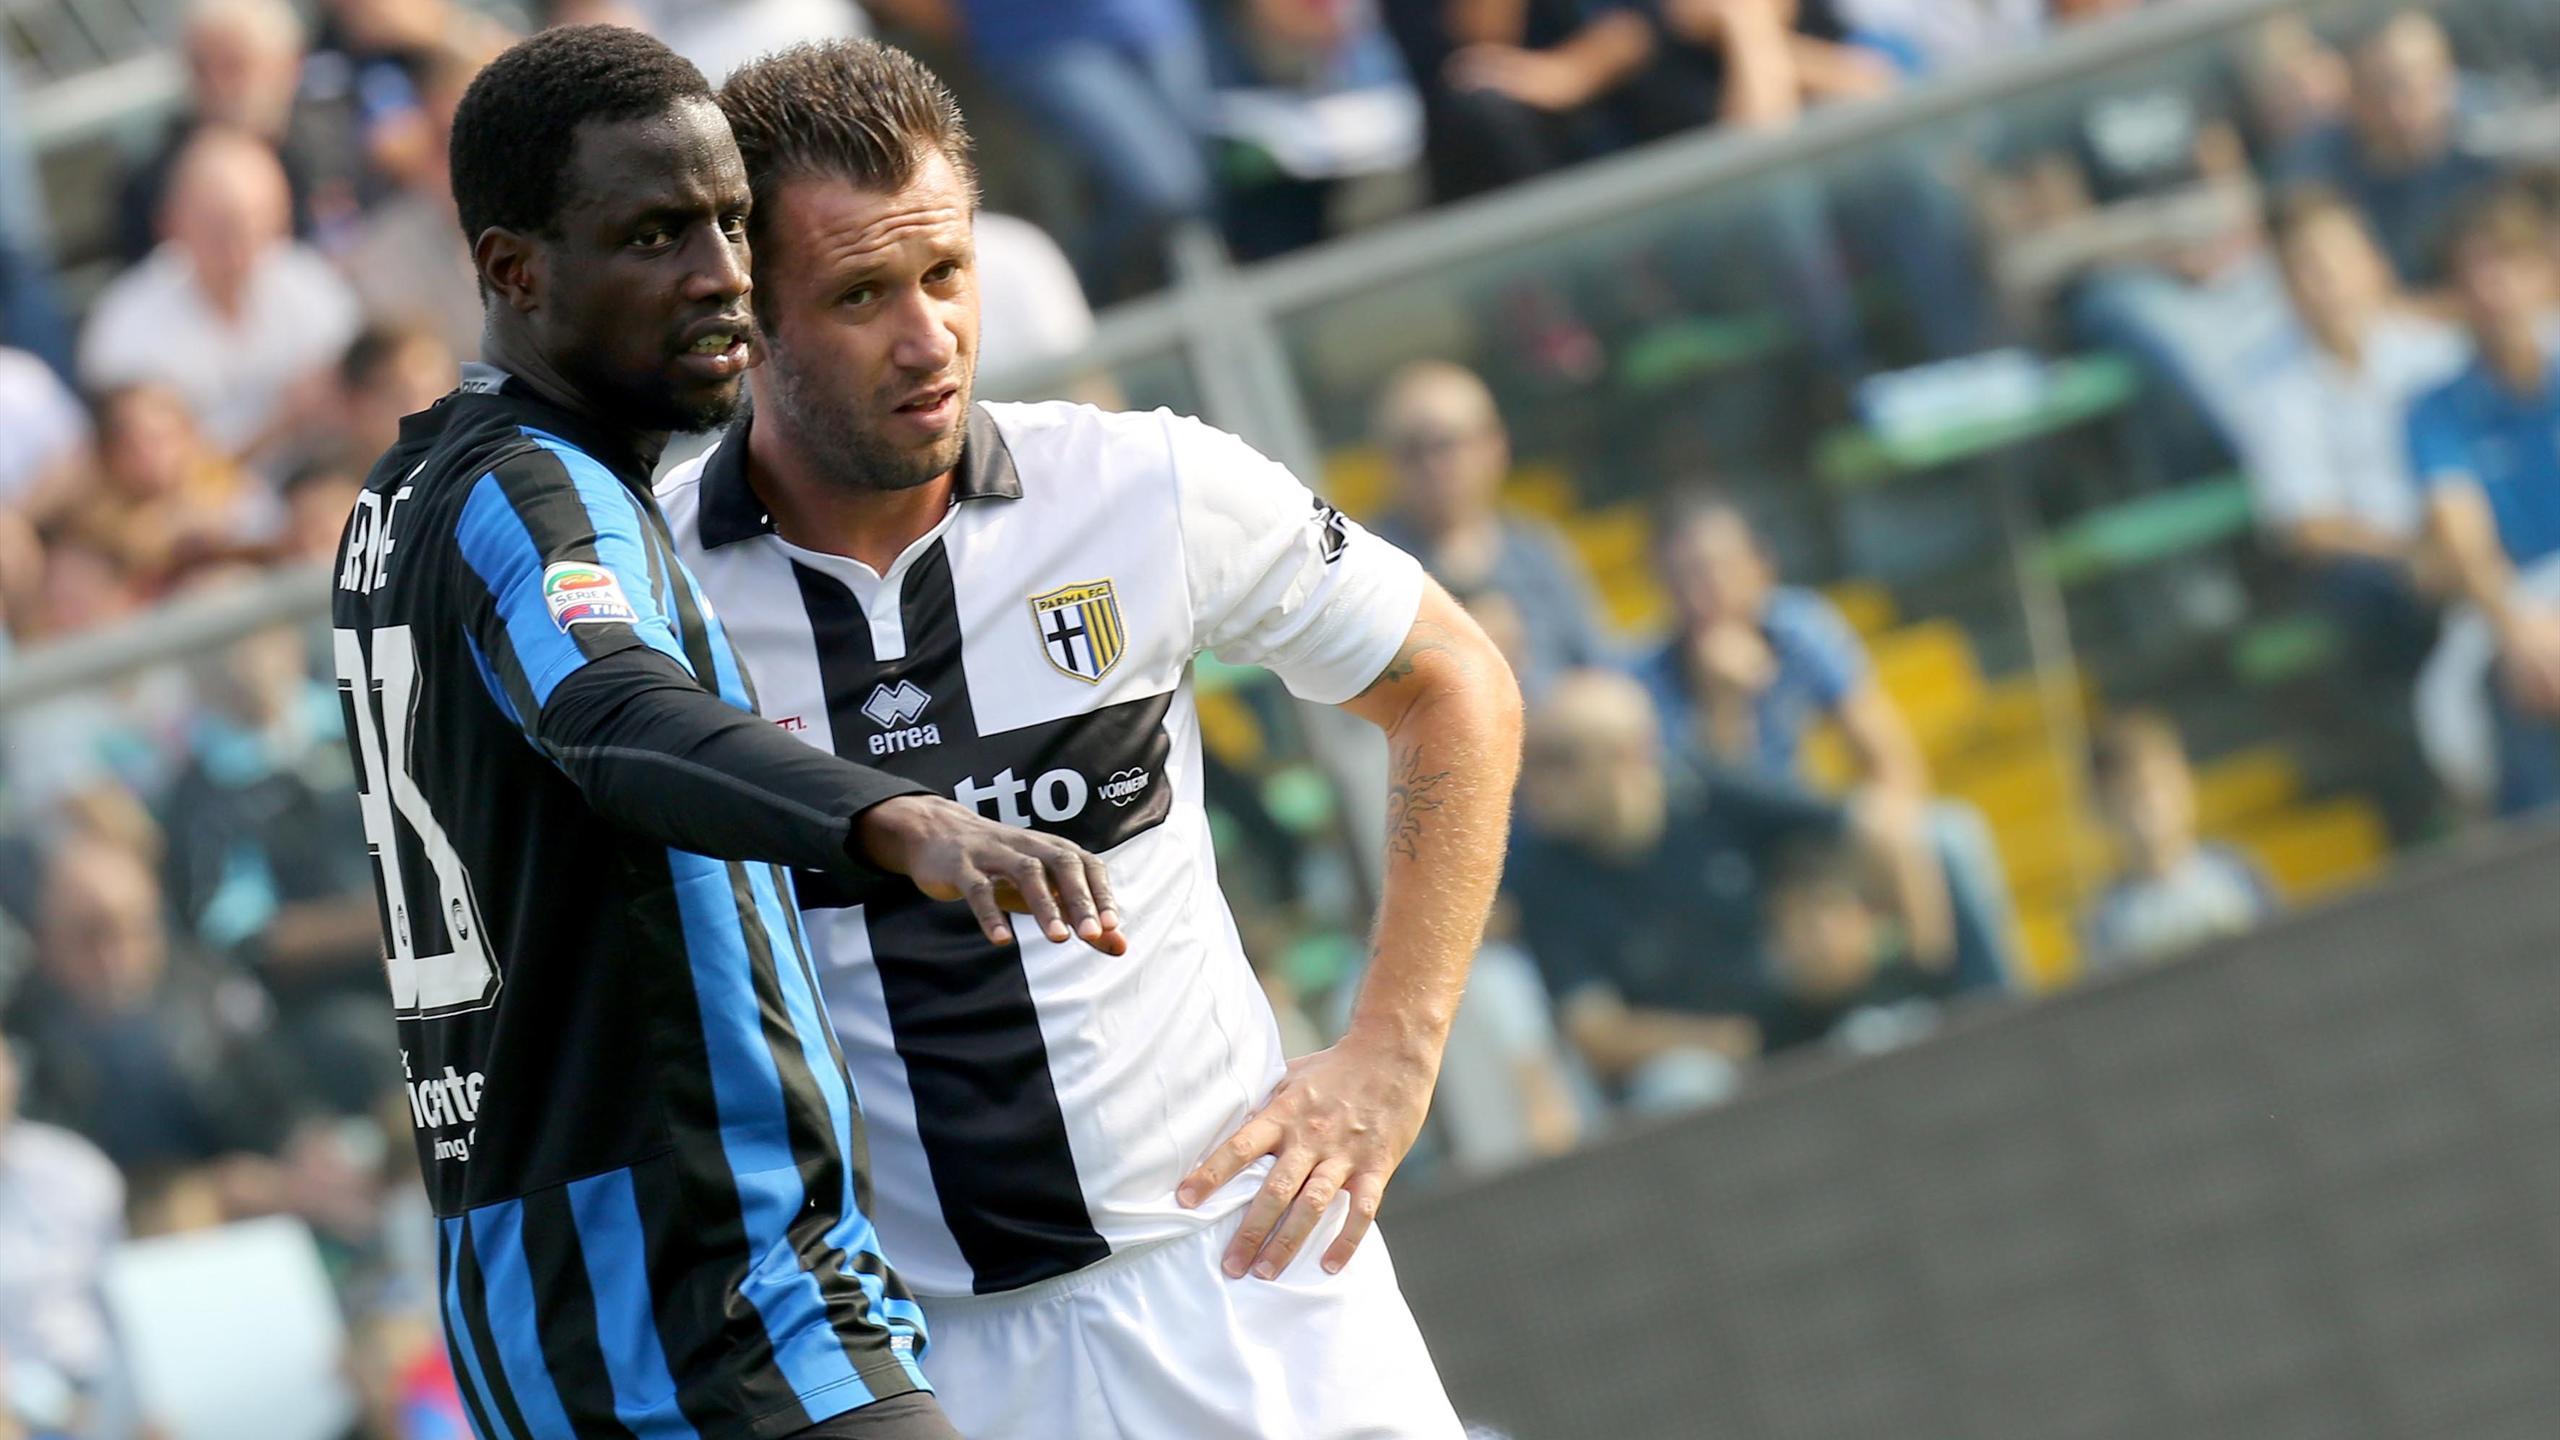 Video: Atalanta vs Parma